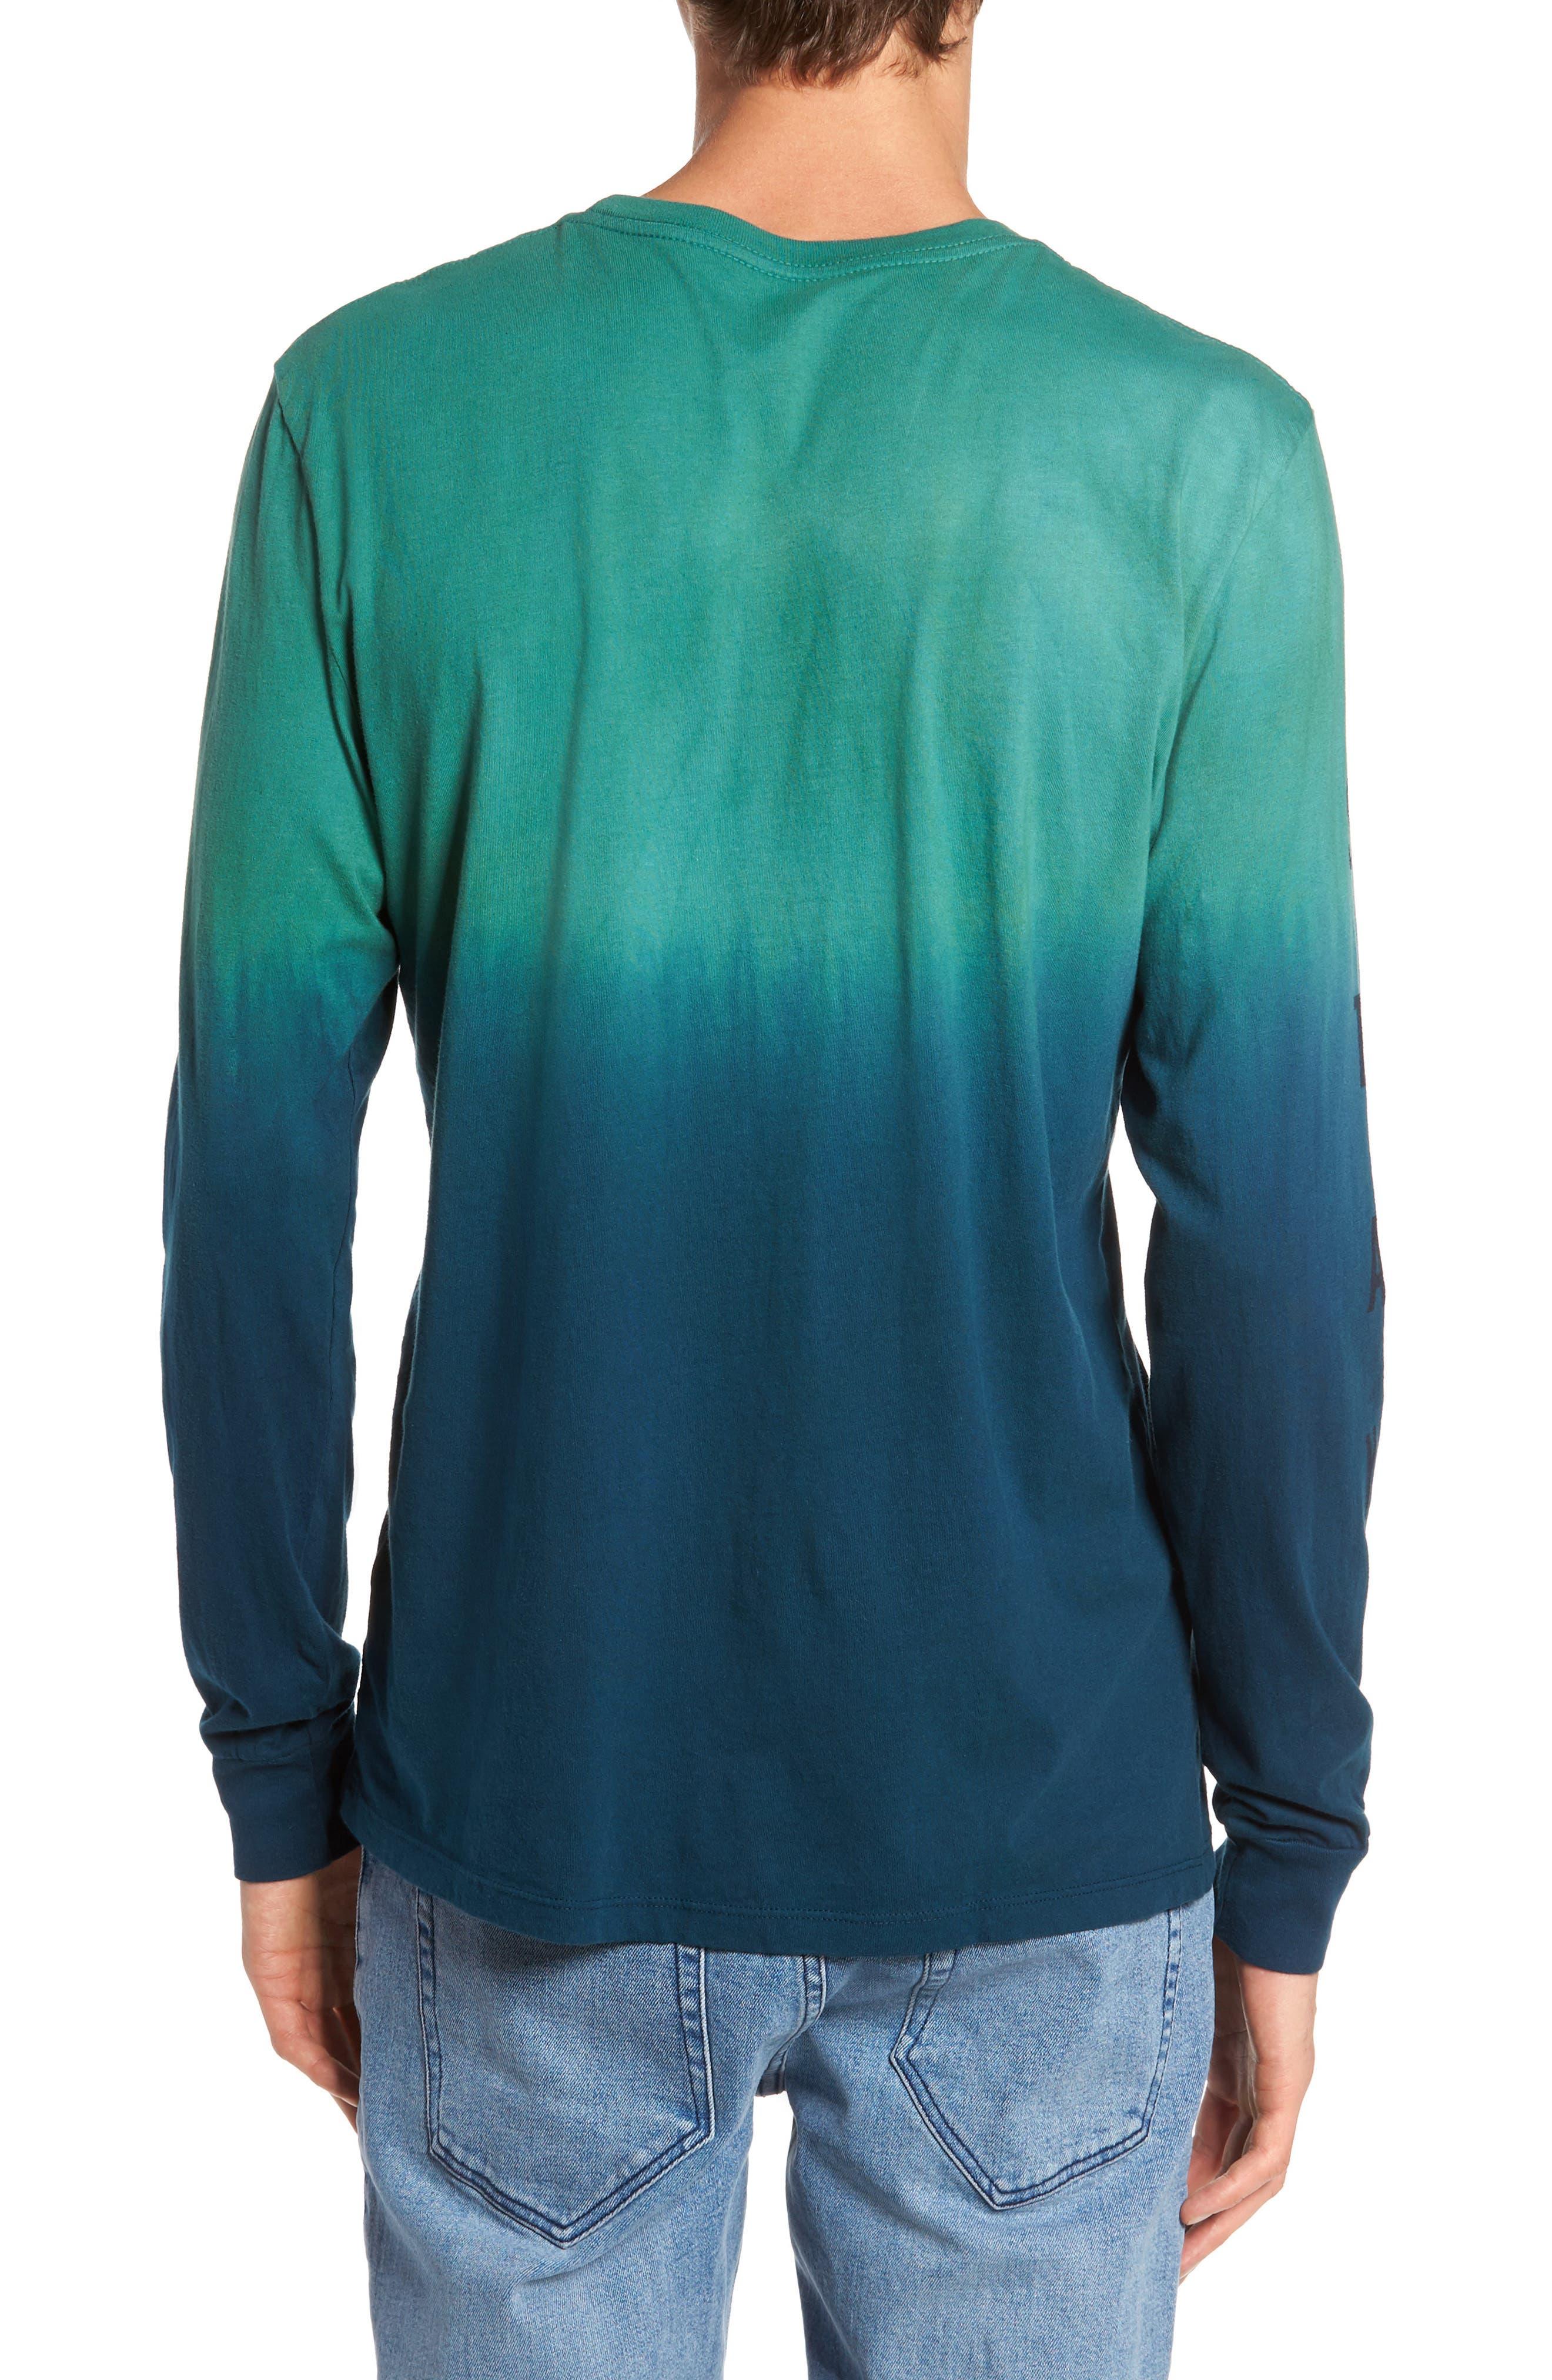 Up a Creek T-Shirt,                             Alternate thumbnail 2, color,                             ALGAE/ NAVY